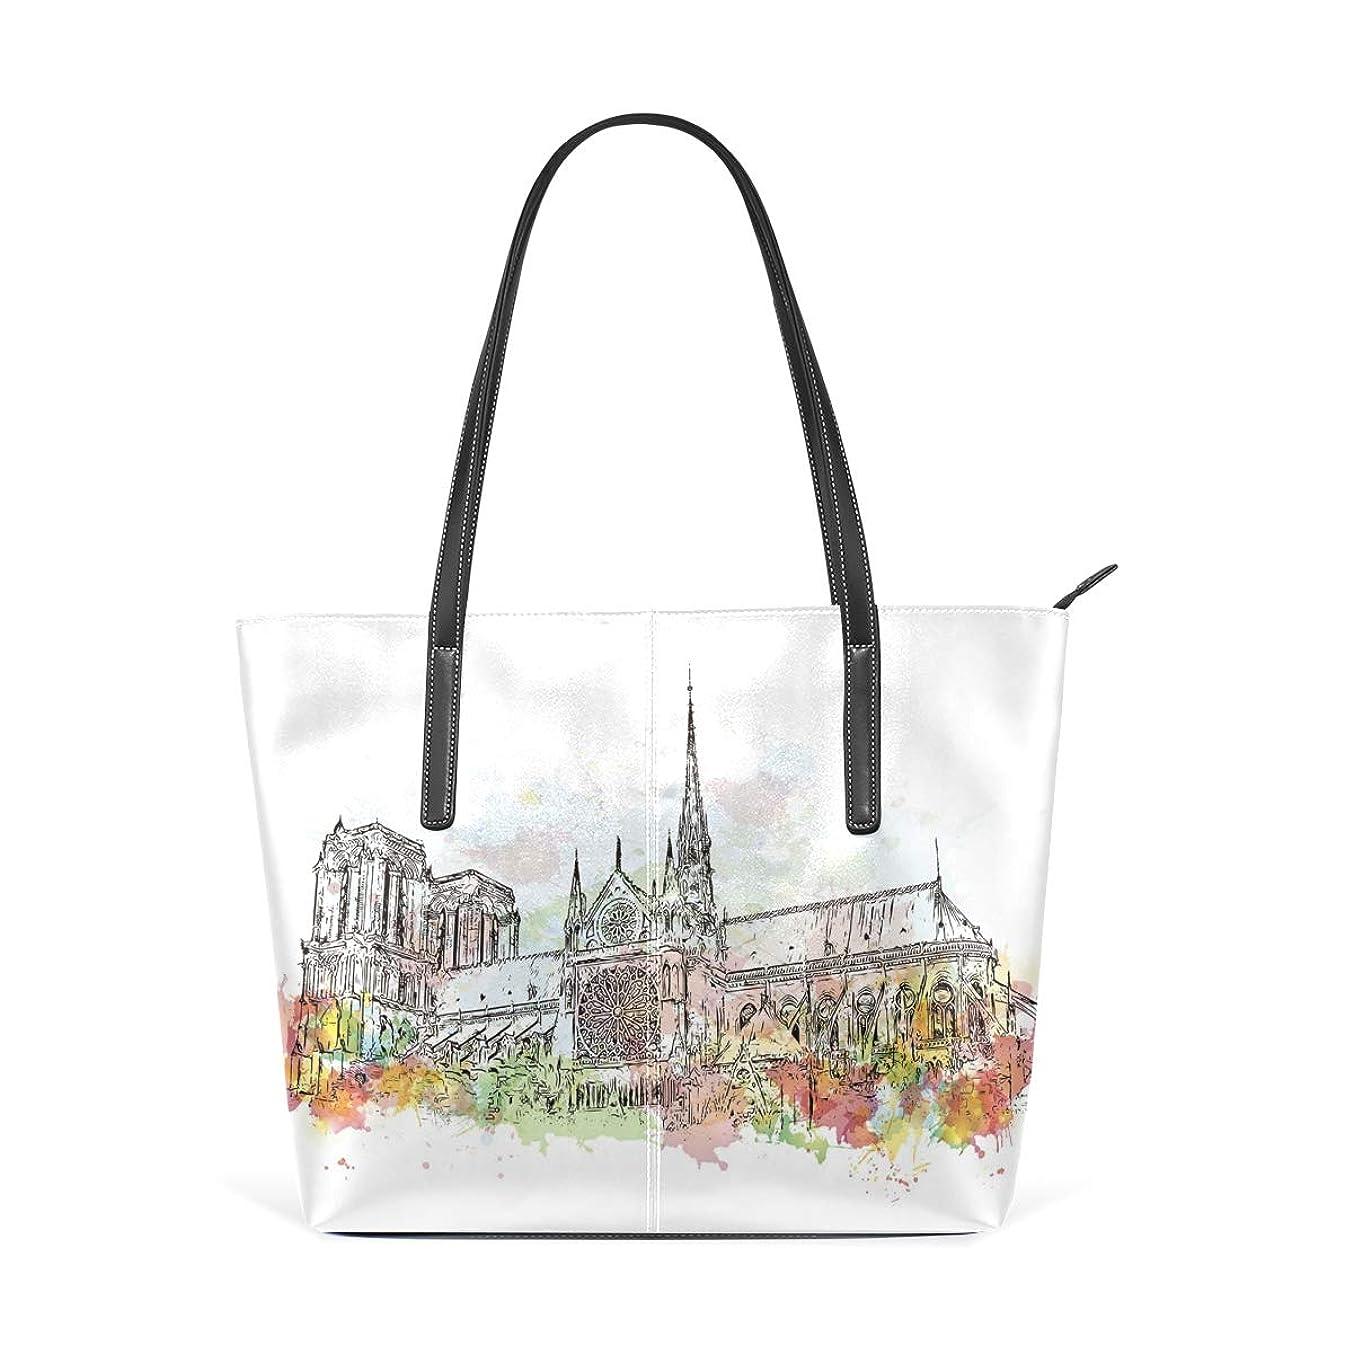 Tarity Women Leather Tote Handbag Watercolor Notre-Dame De Paris France Fashion Casual Handle Bag Crossbody Shoulder Bag Purse Large Capacity Durable For Shopping Laptop School Books Travel Beach